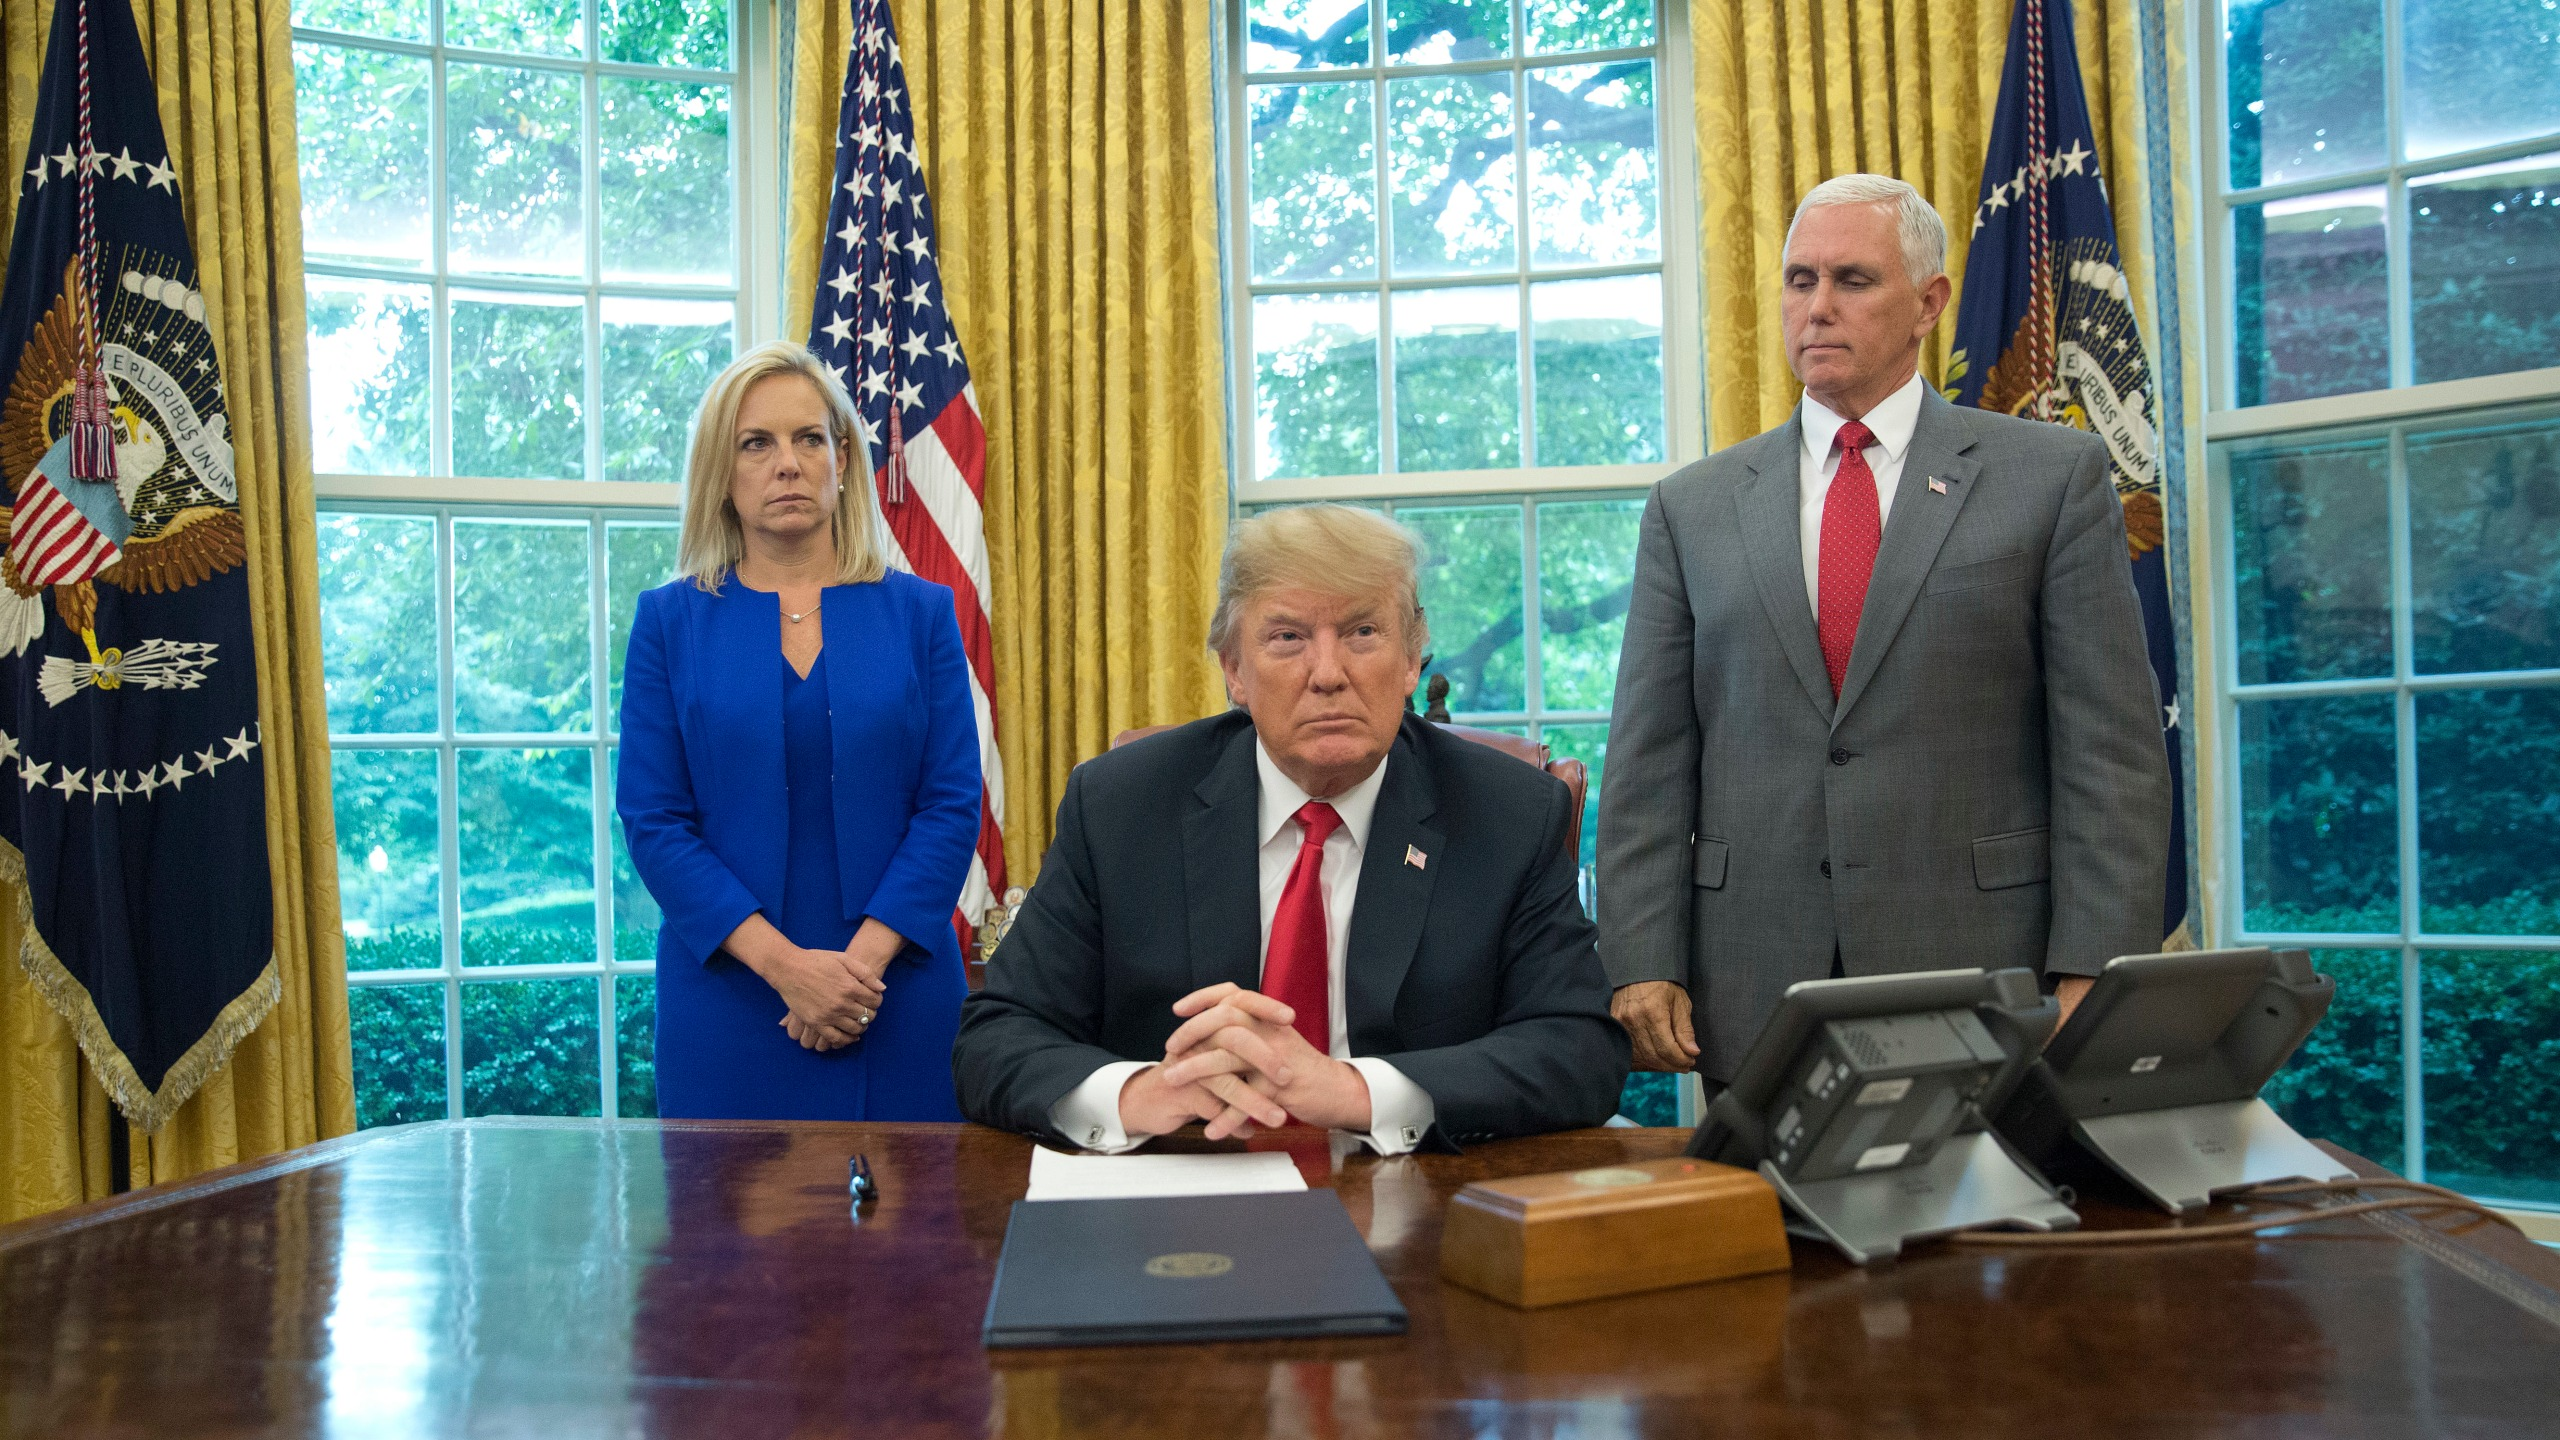 Trump_Immigration_91486-159532.jpg08326338